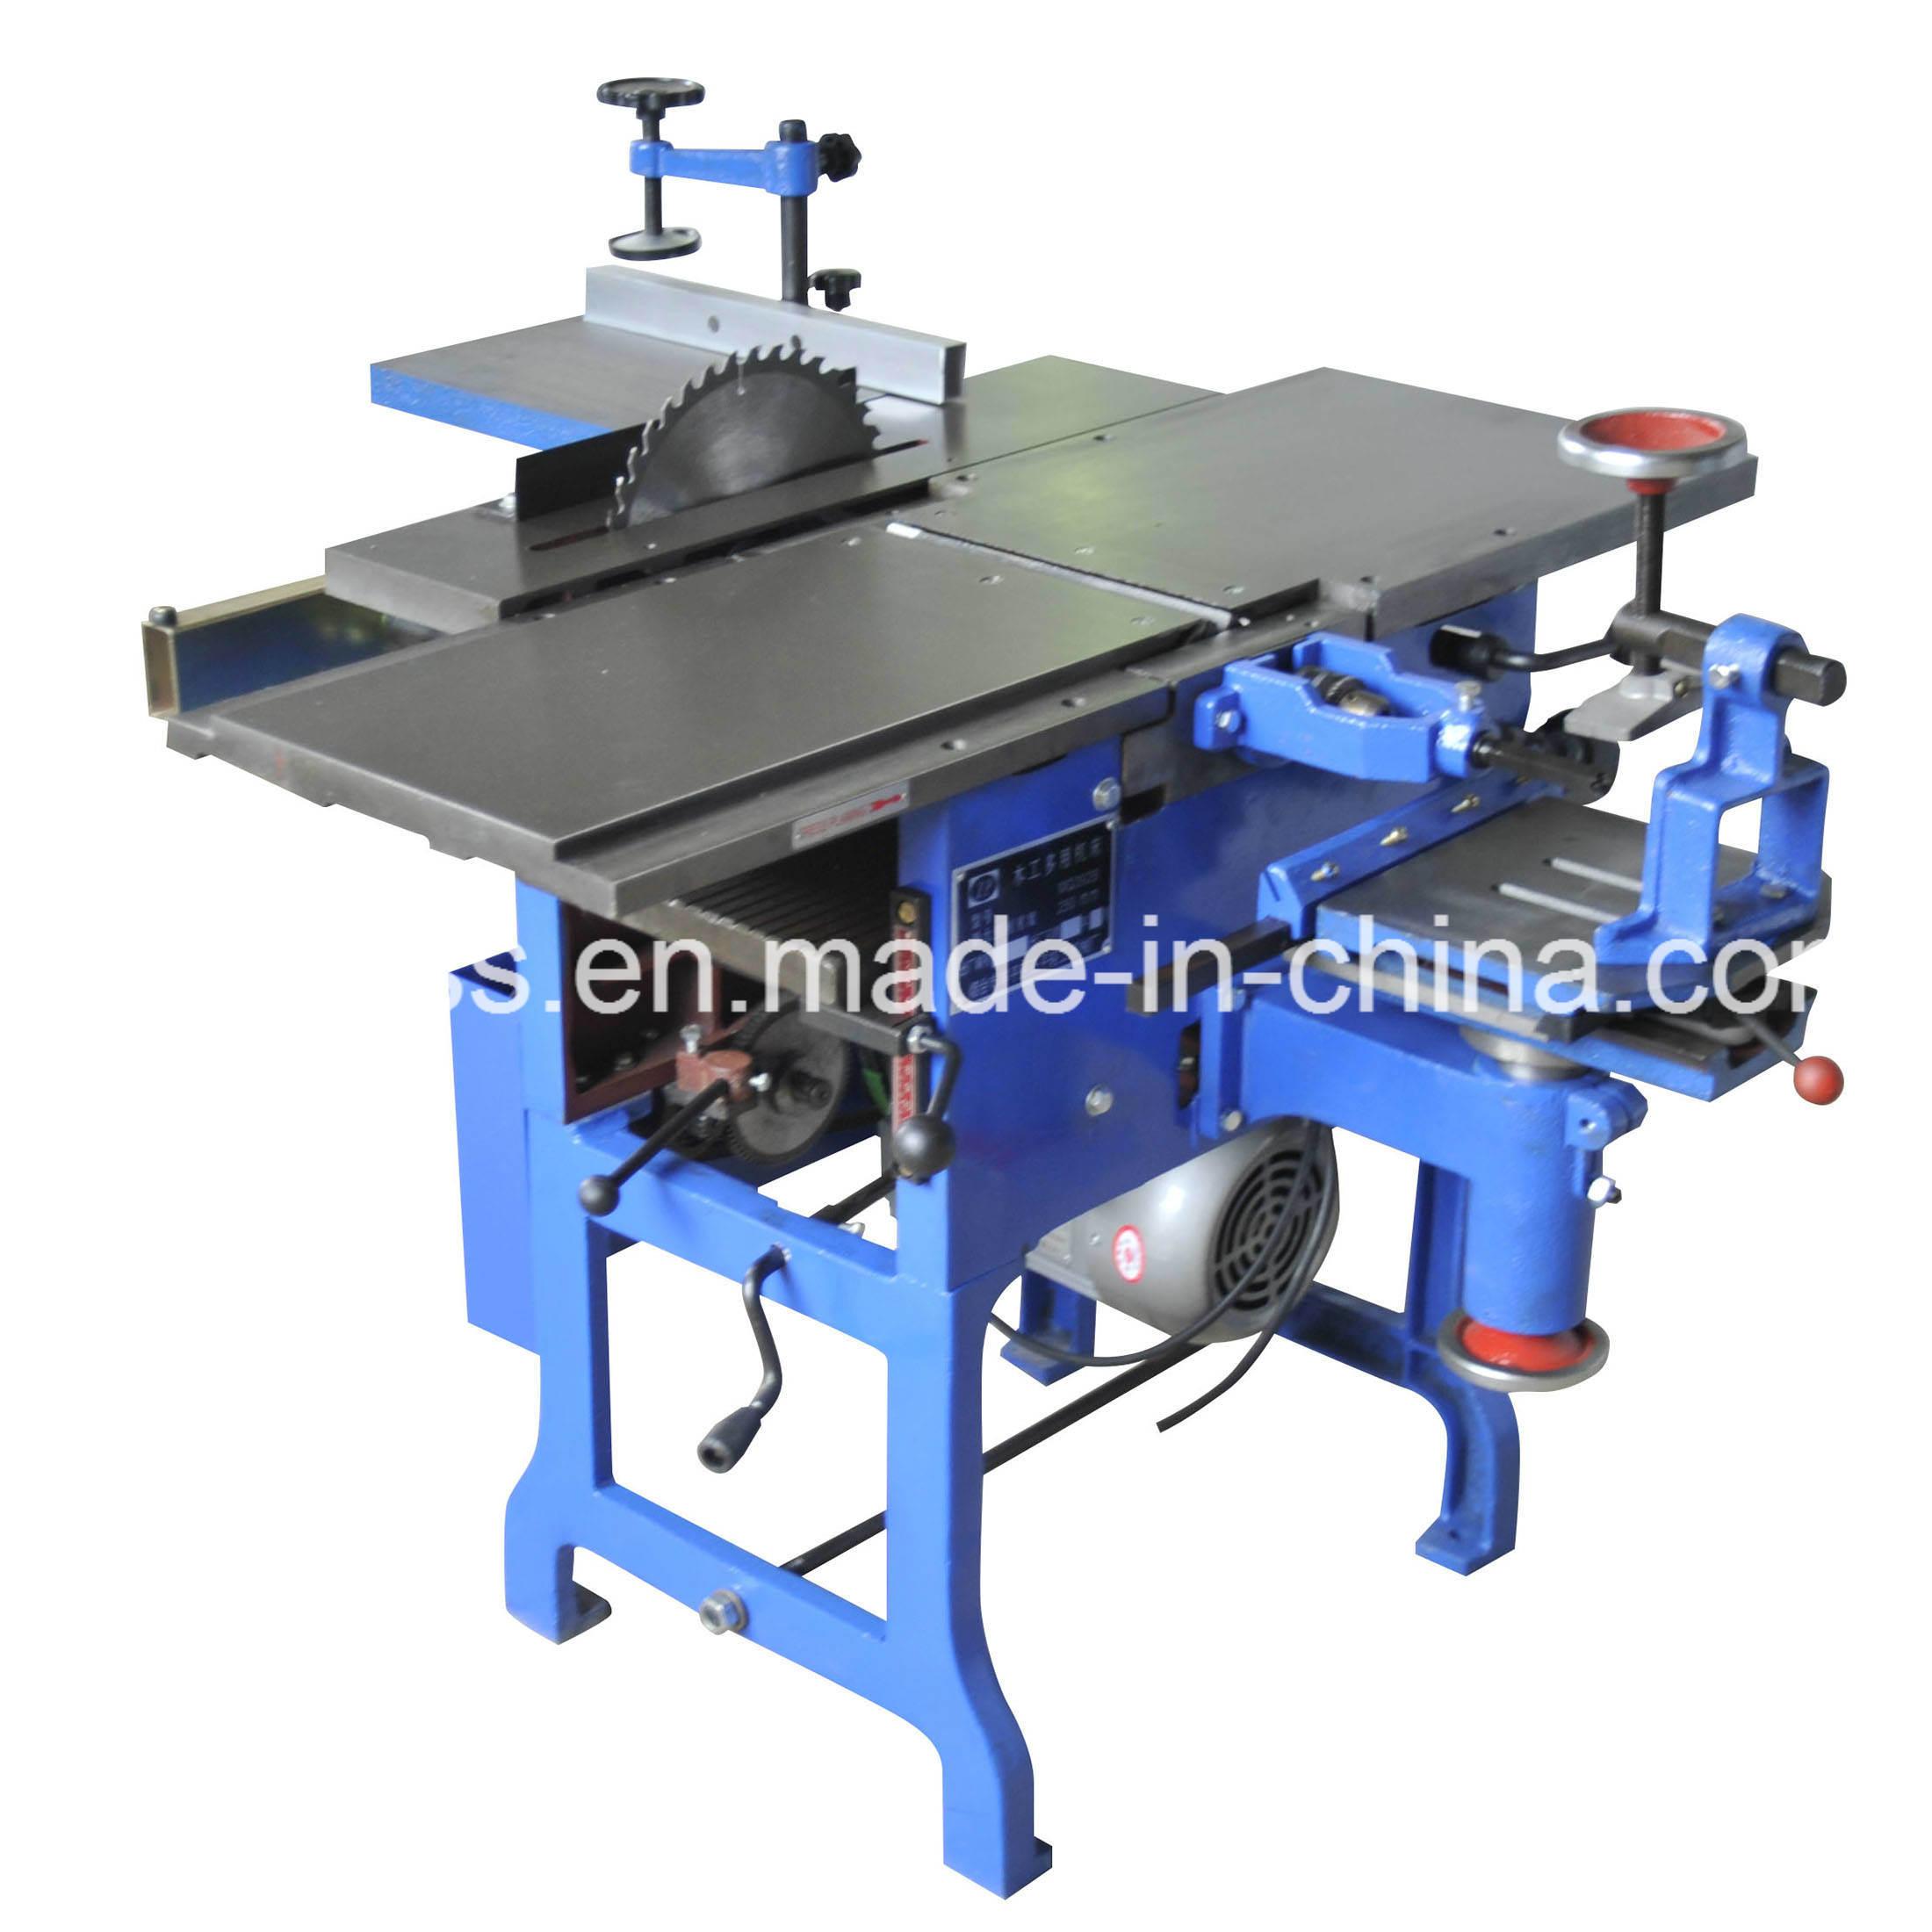 Multi Purpose Woodworking Machine